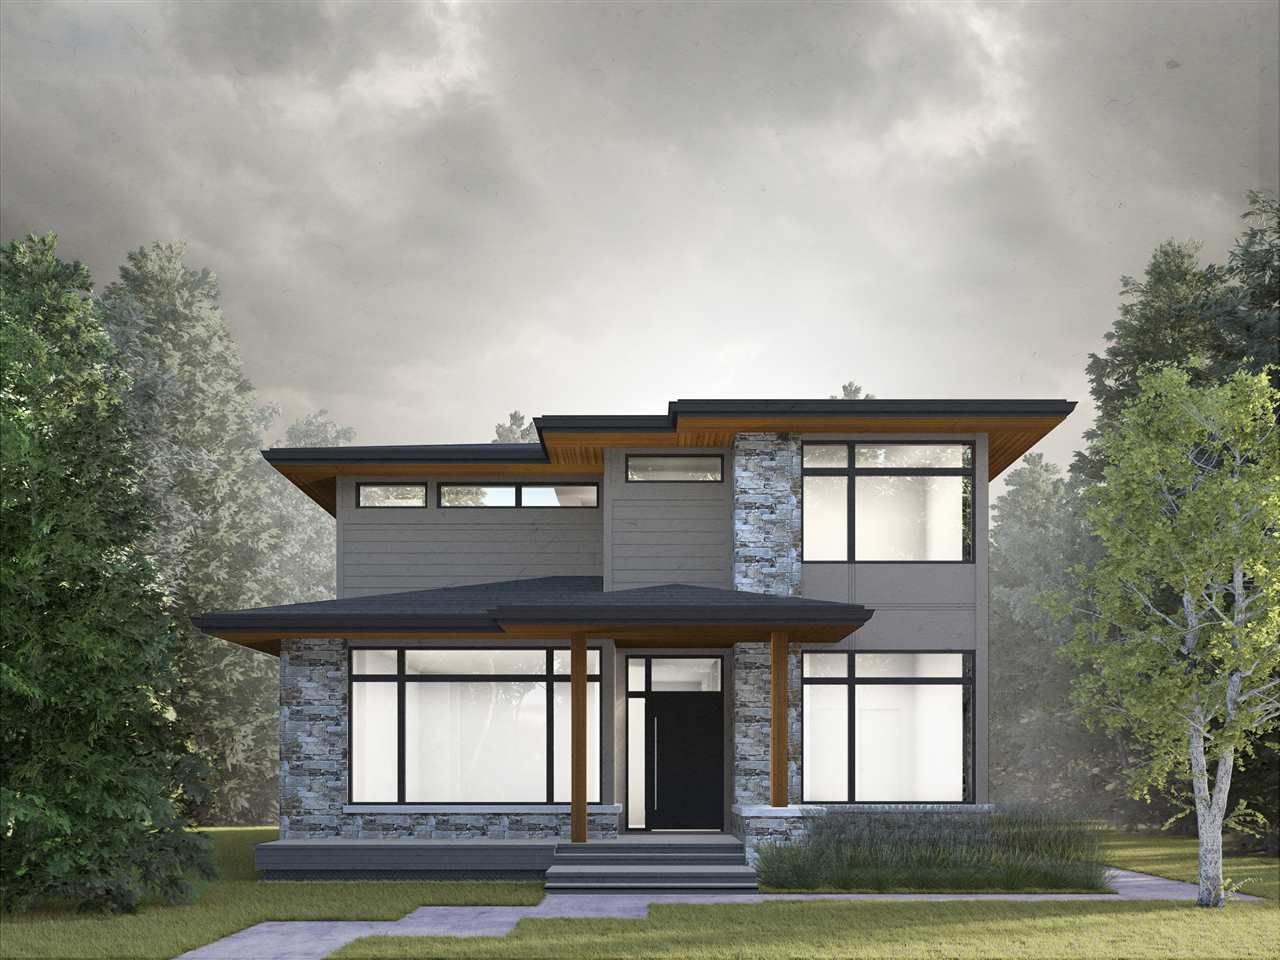 Main Photo: 9706 143 Street in Edmonton: Zone 10 House for sale : MLS®# E4162232